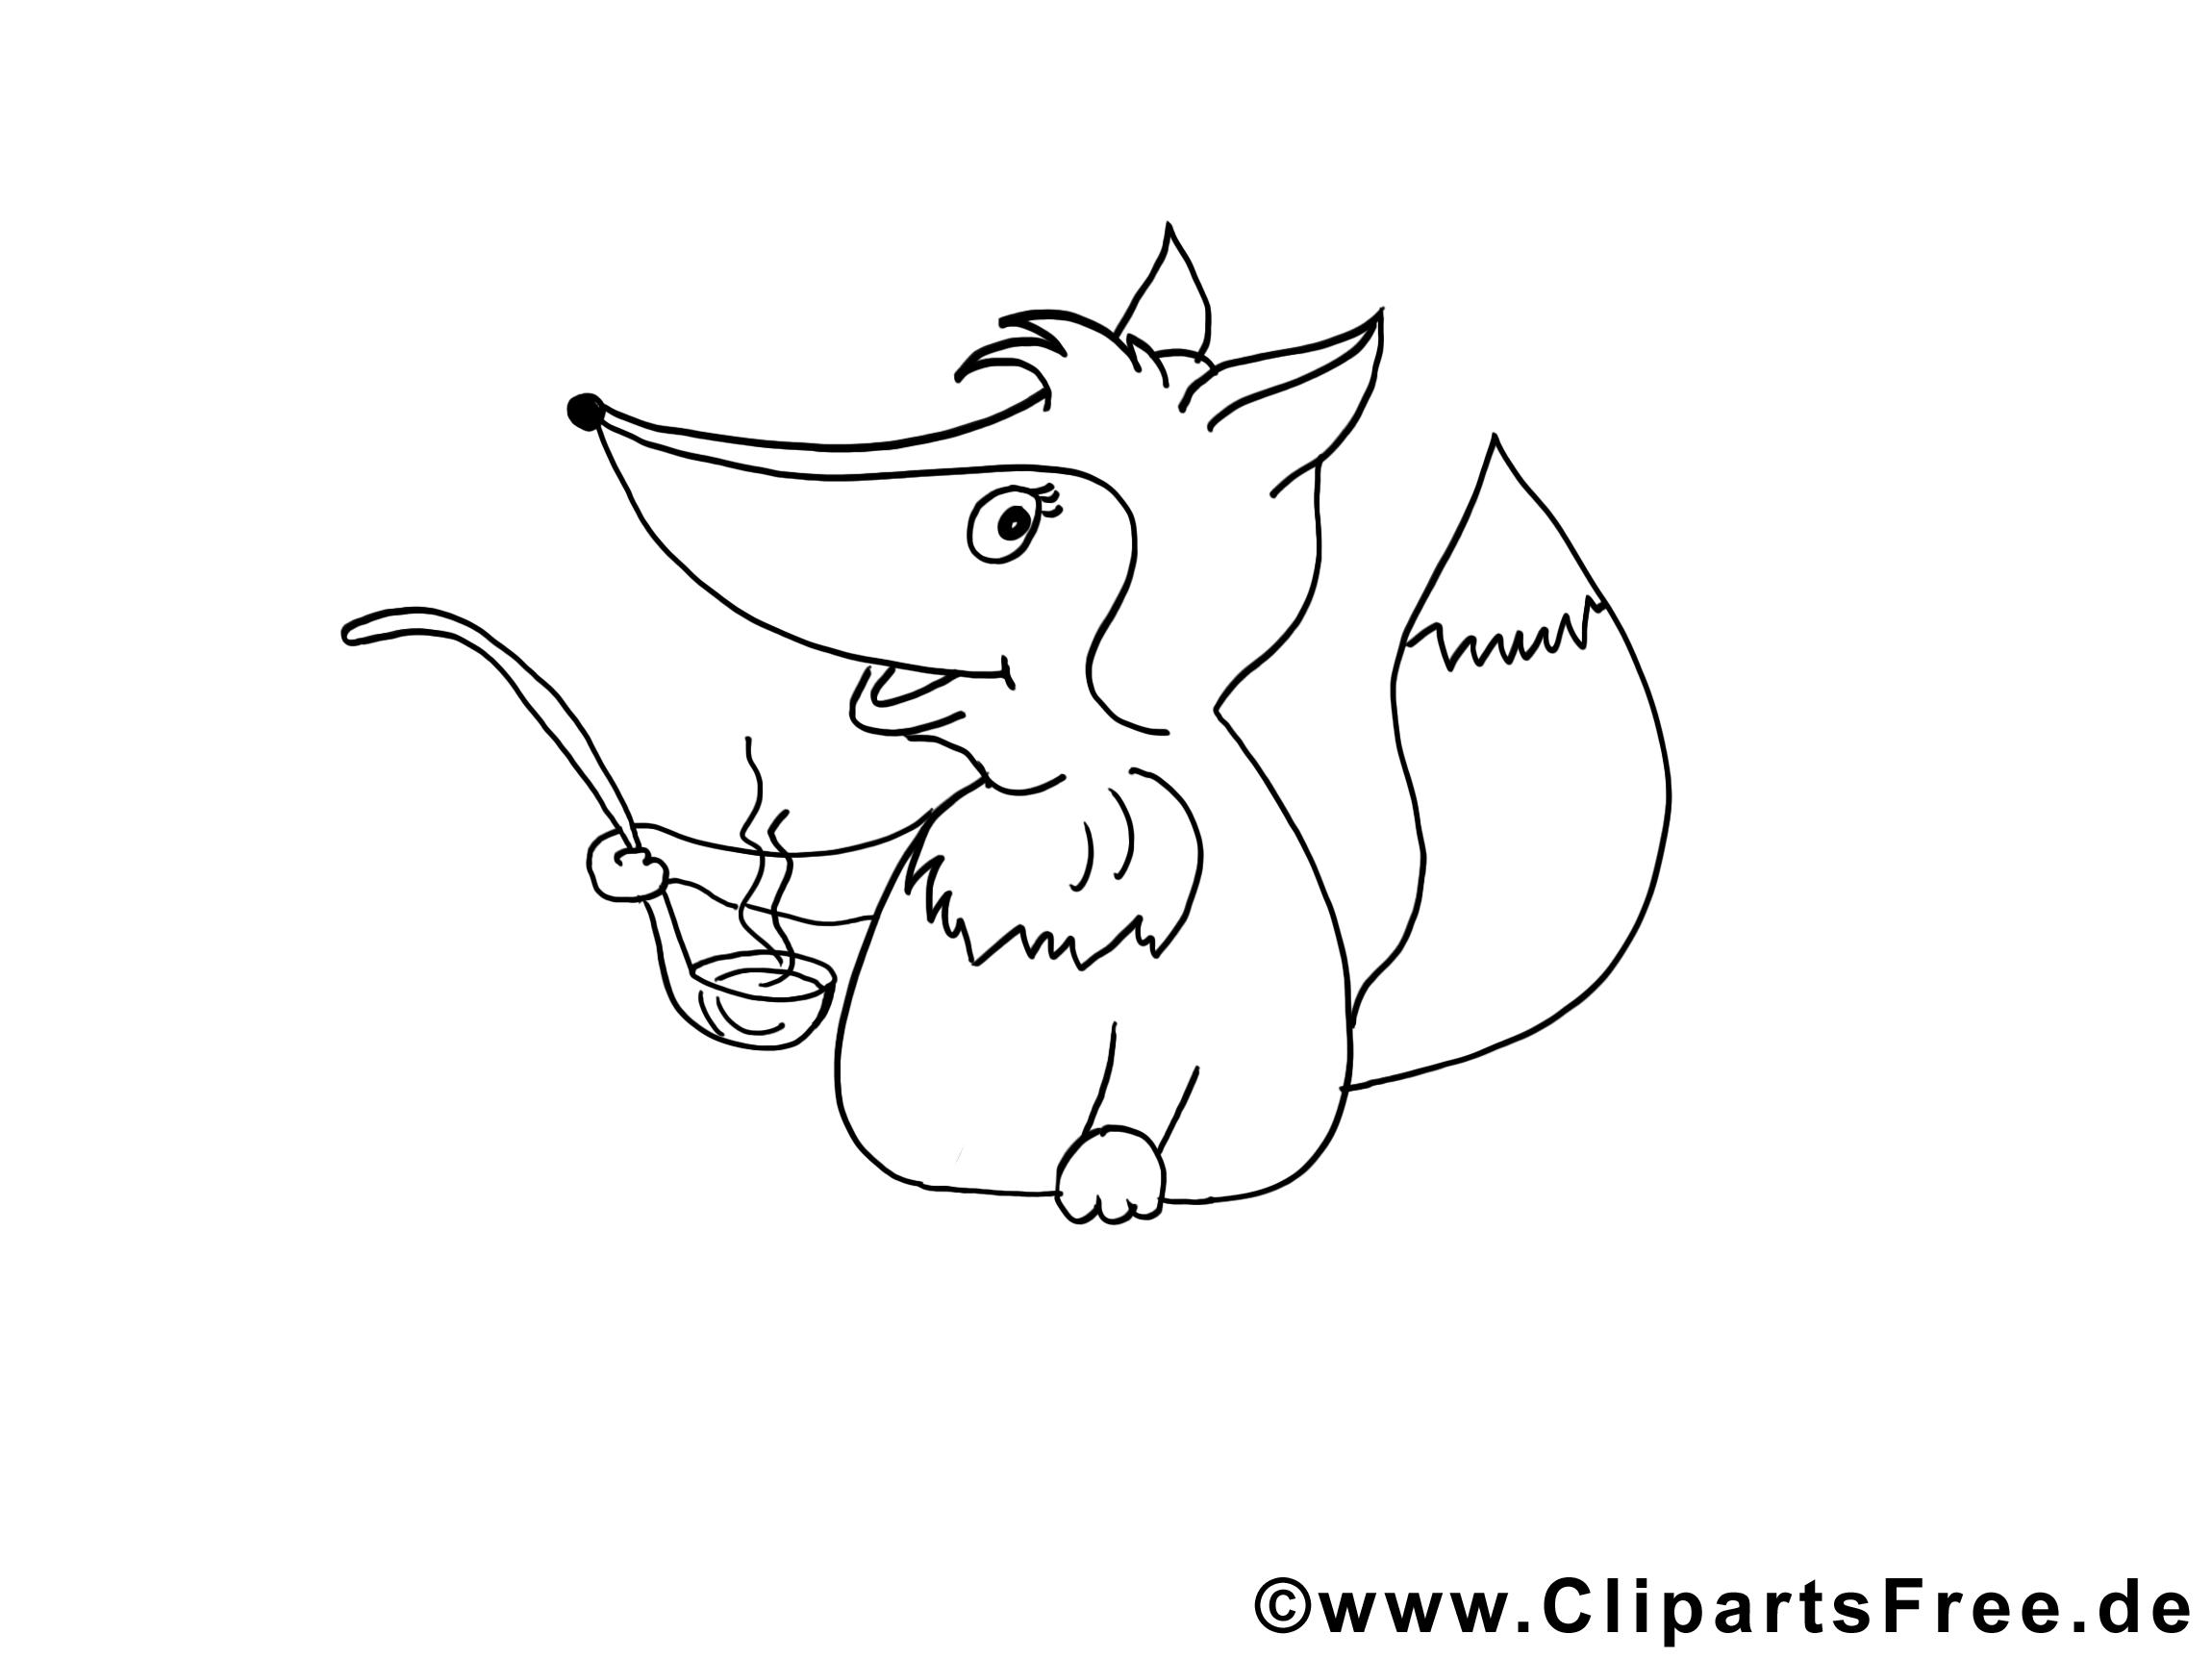 Girafe images – Animal gratuits à imprimer